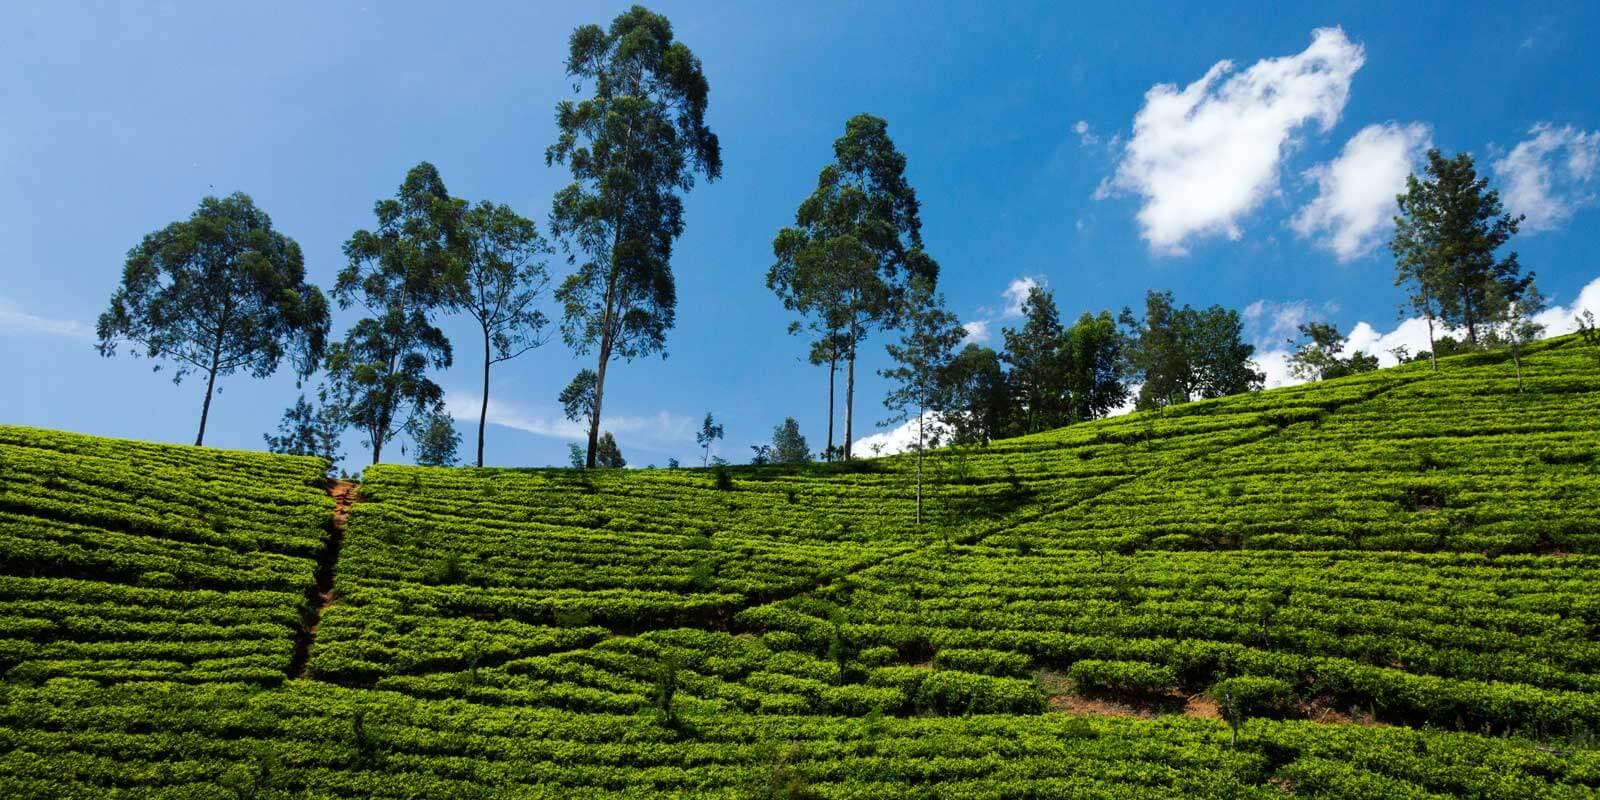 Landscape view of a tea field.